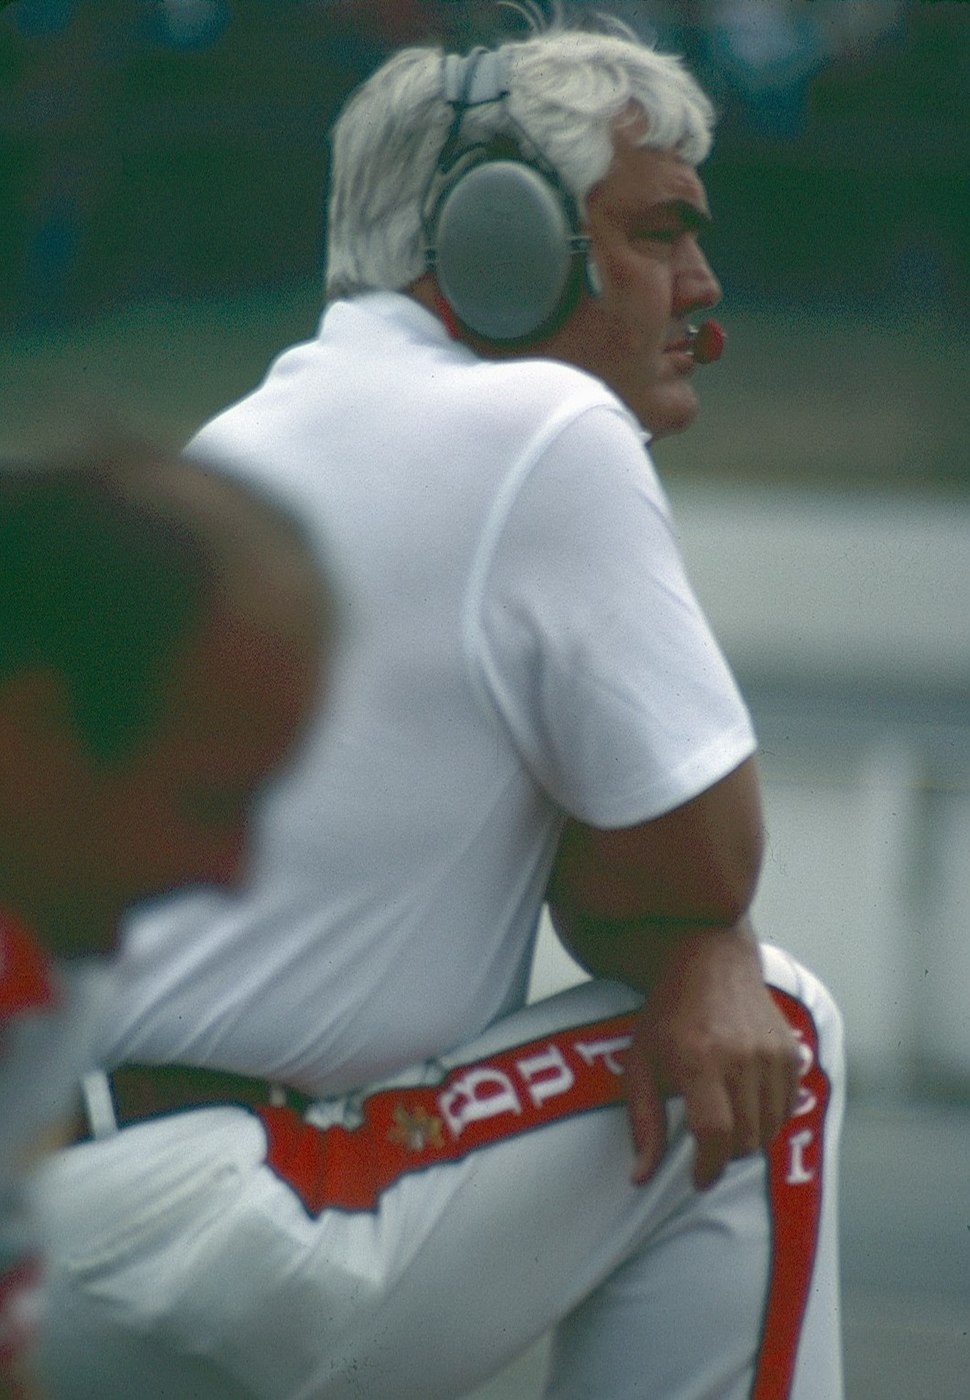 JuniorJohnson1985